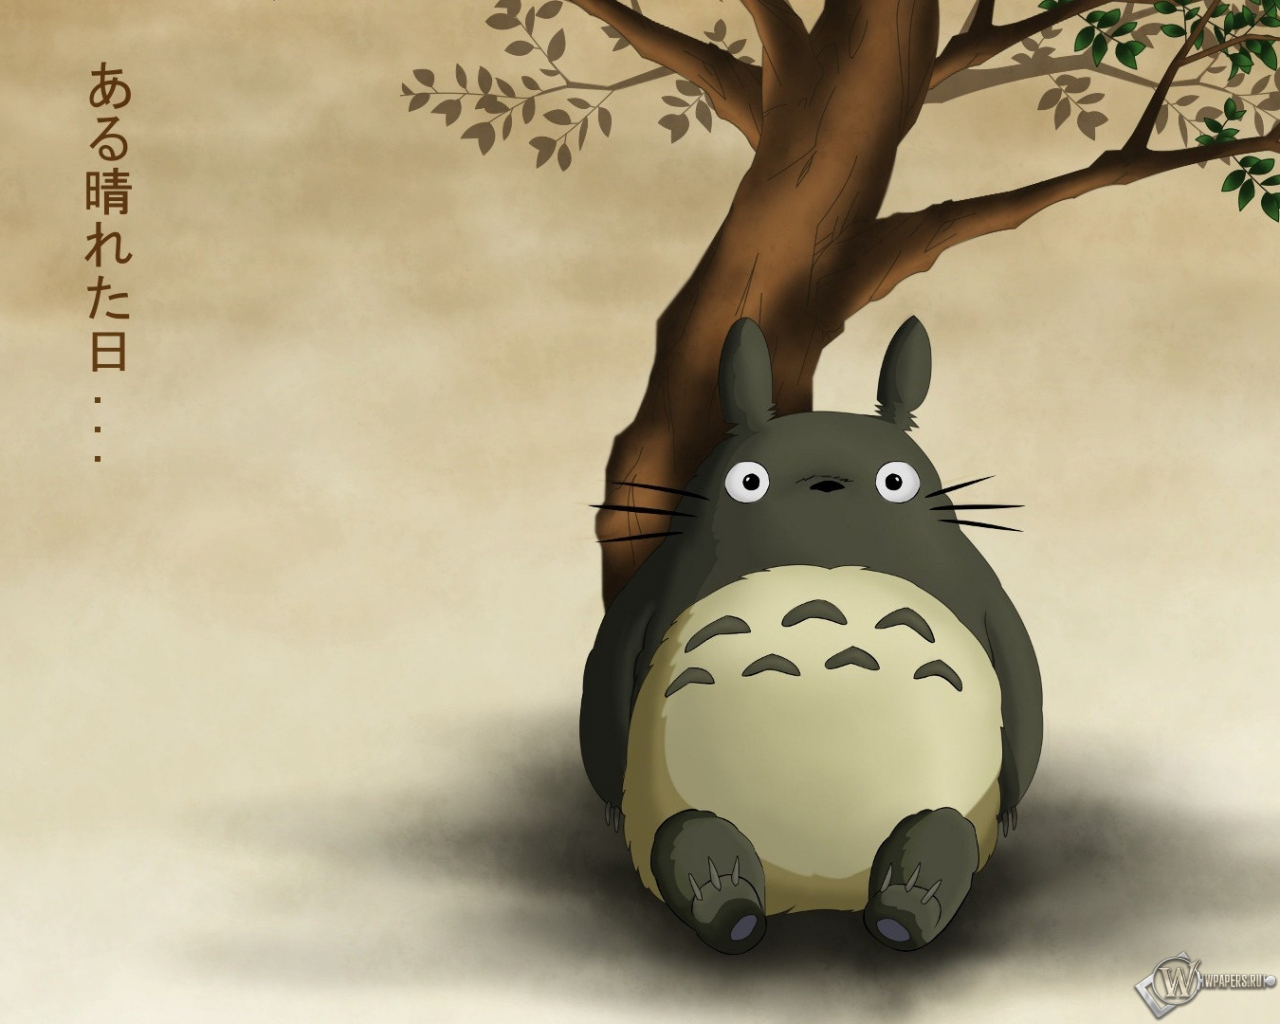 Обои totoro My Neighbor Totoro дождь Mei Kusakabe зонт